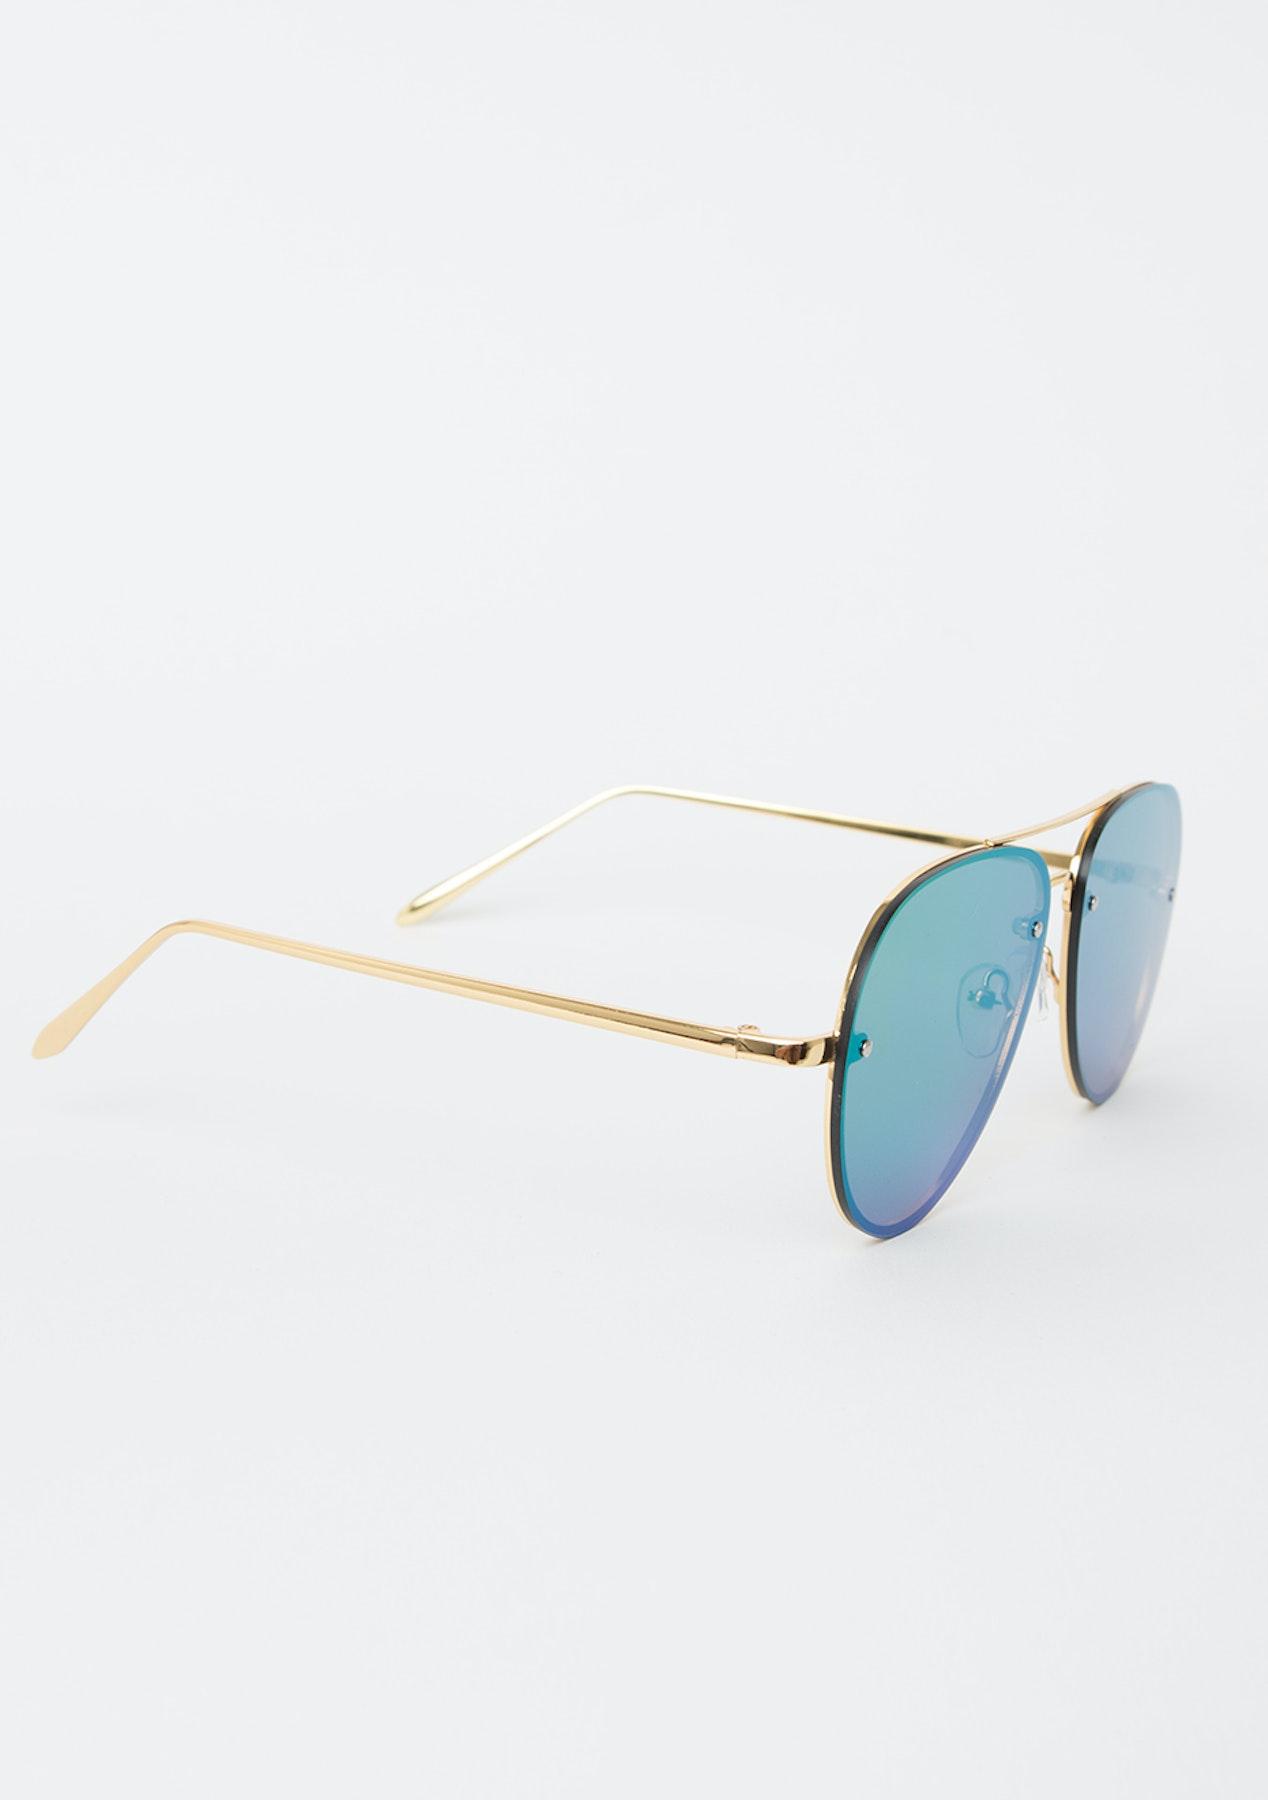 Mosmann Australia - Gold frames with Pink mirror lens - Eyewear ...